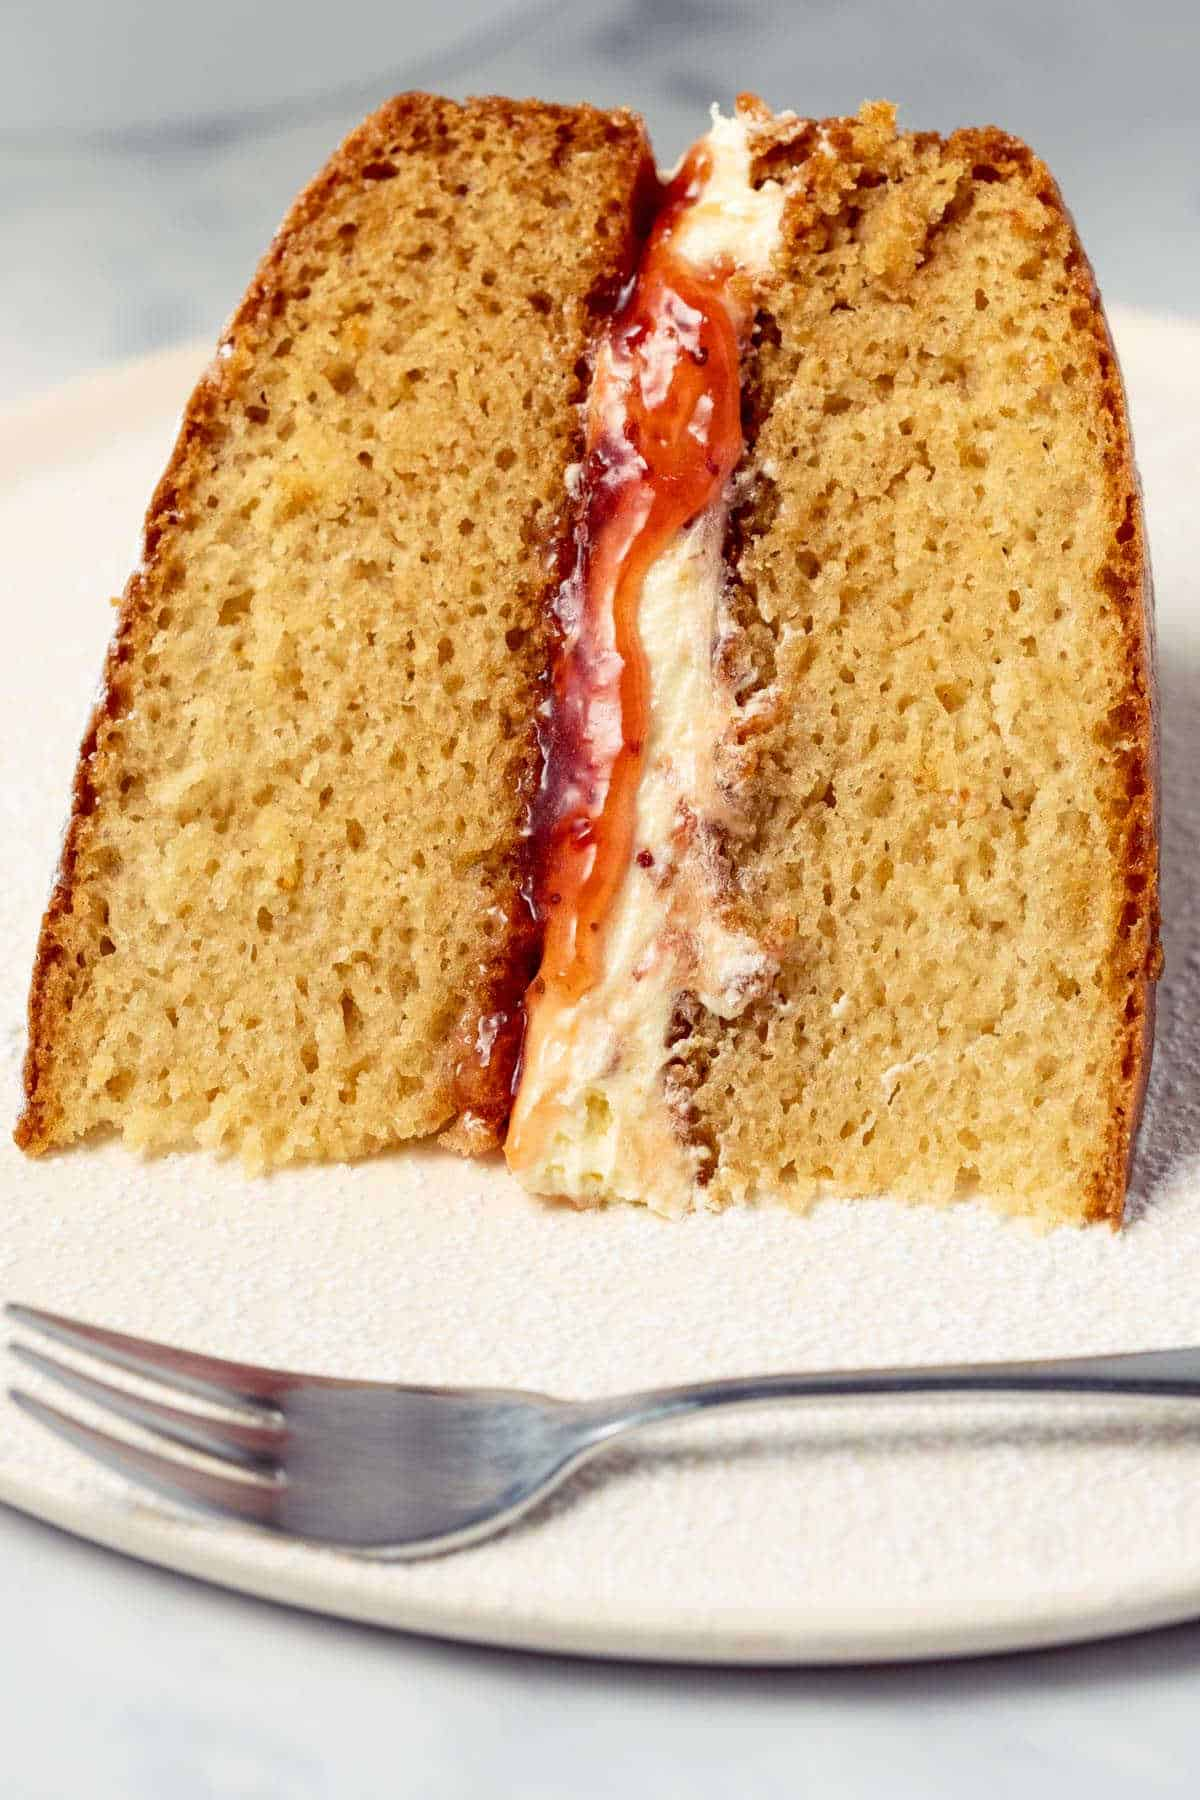 Slice of vegan Victoria sponge cake on a white plate.